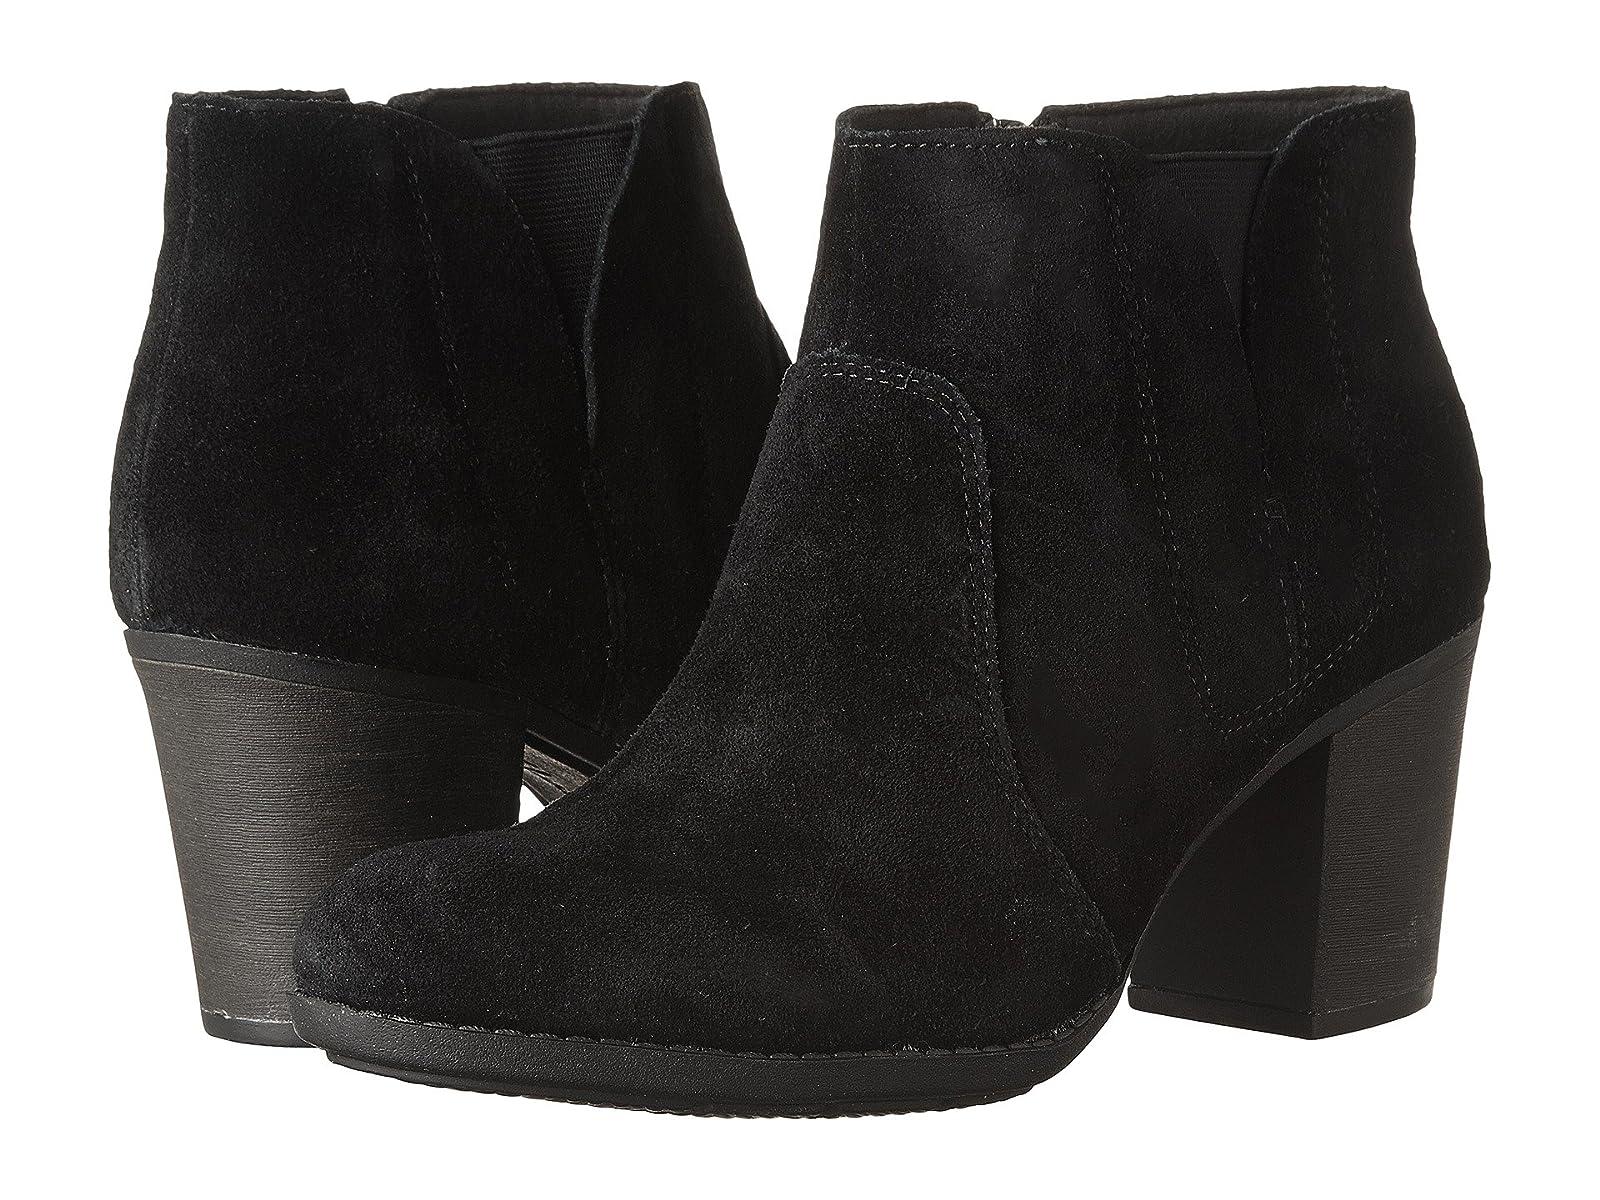 Clarks Enfield SenyaCheap and distinctive eye-catching shoes